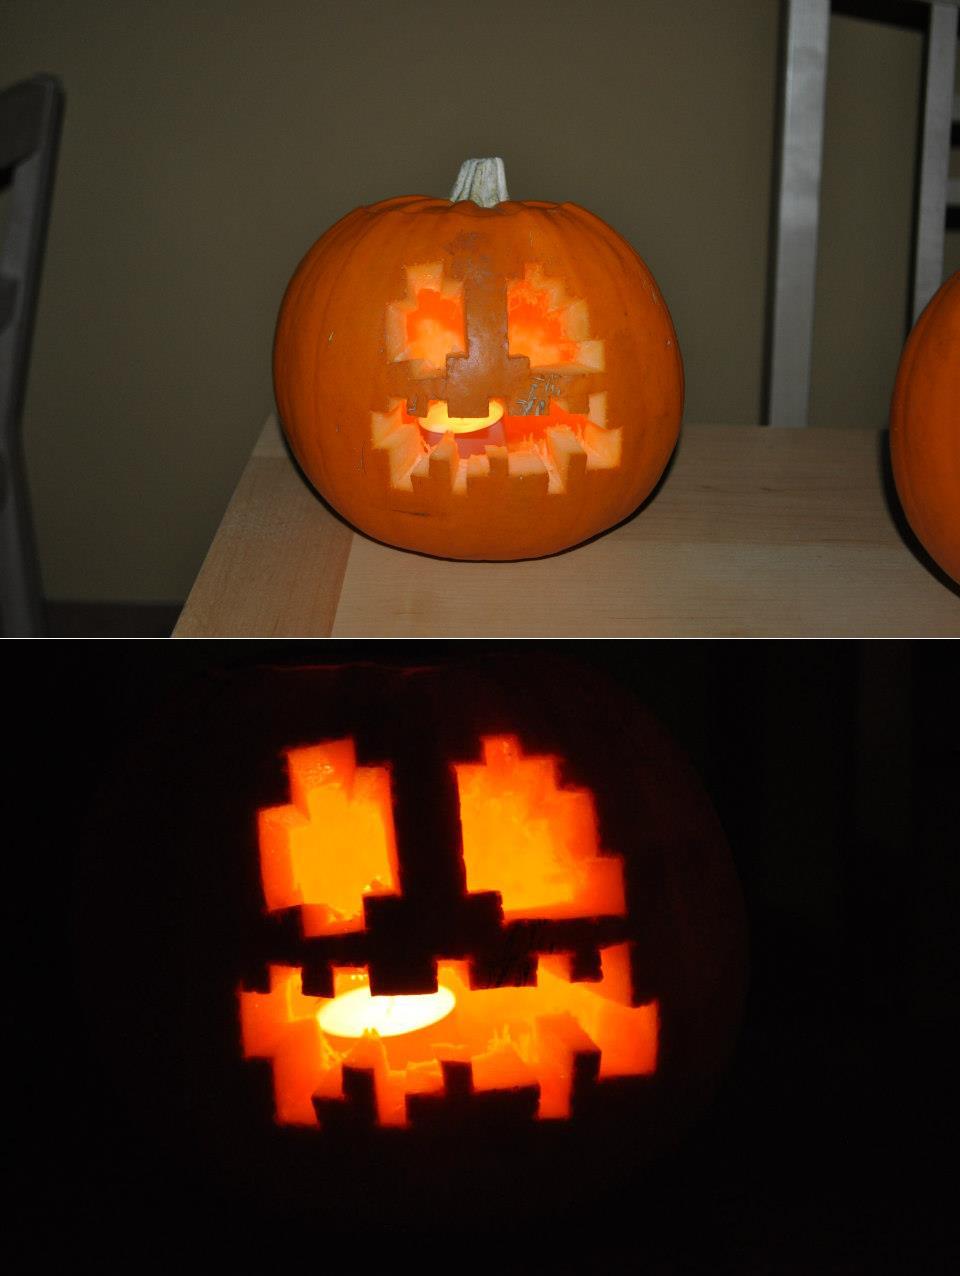 Minecraft pumpkin template imgkid the image